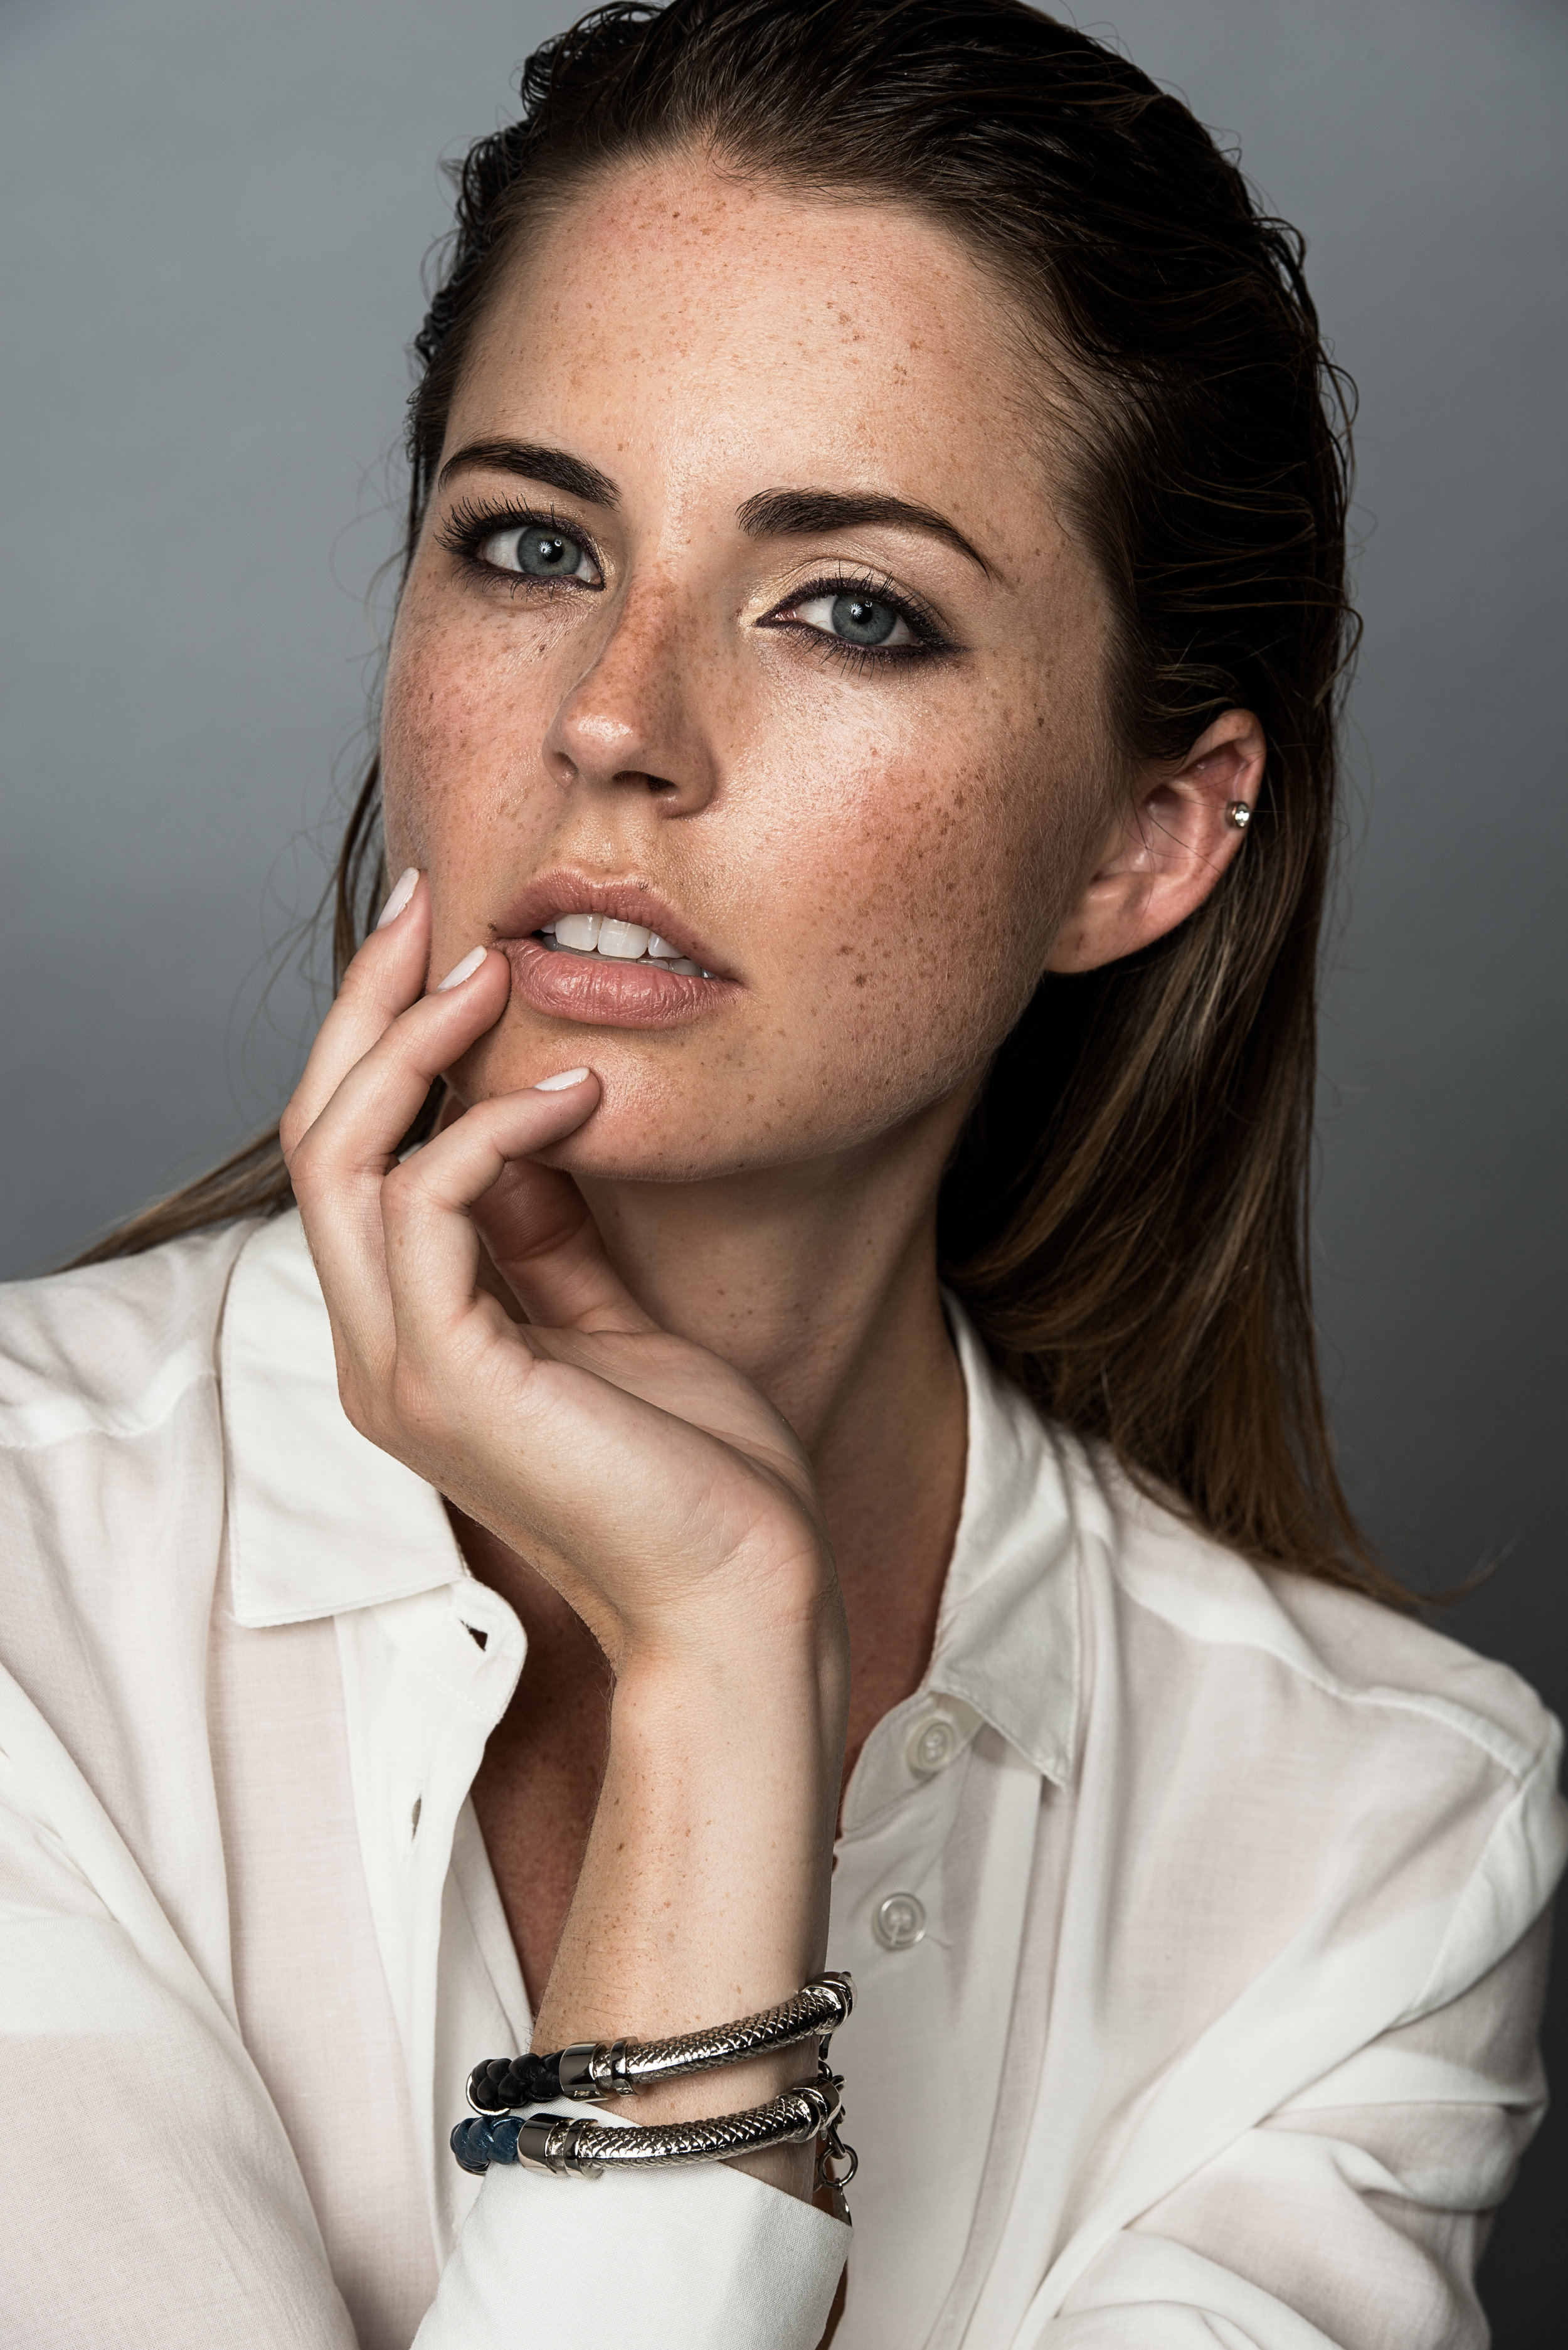 Lindsey_Weller.jpg